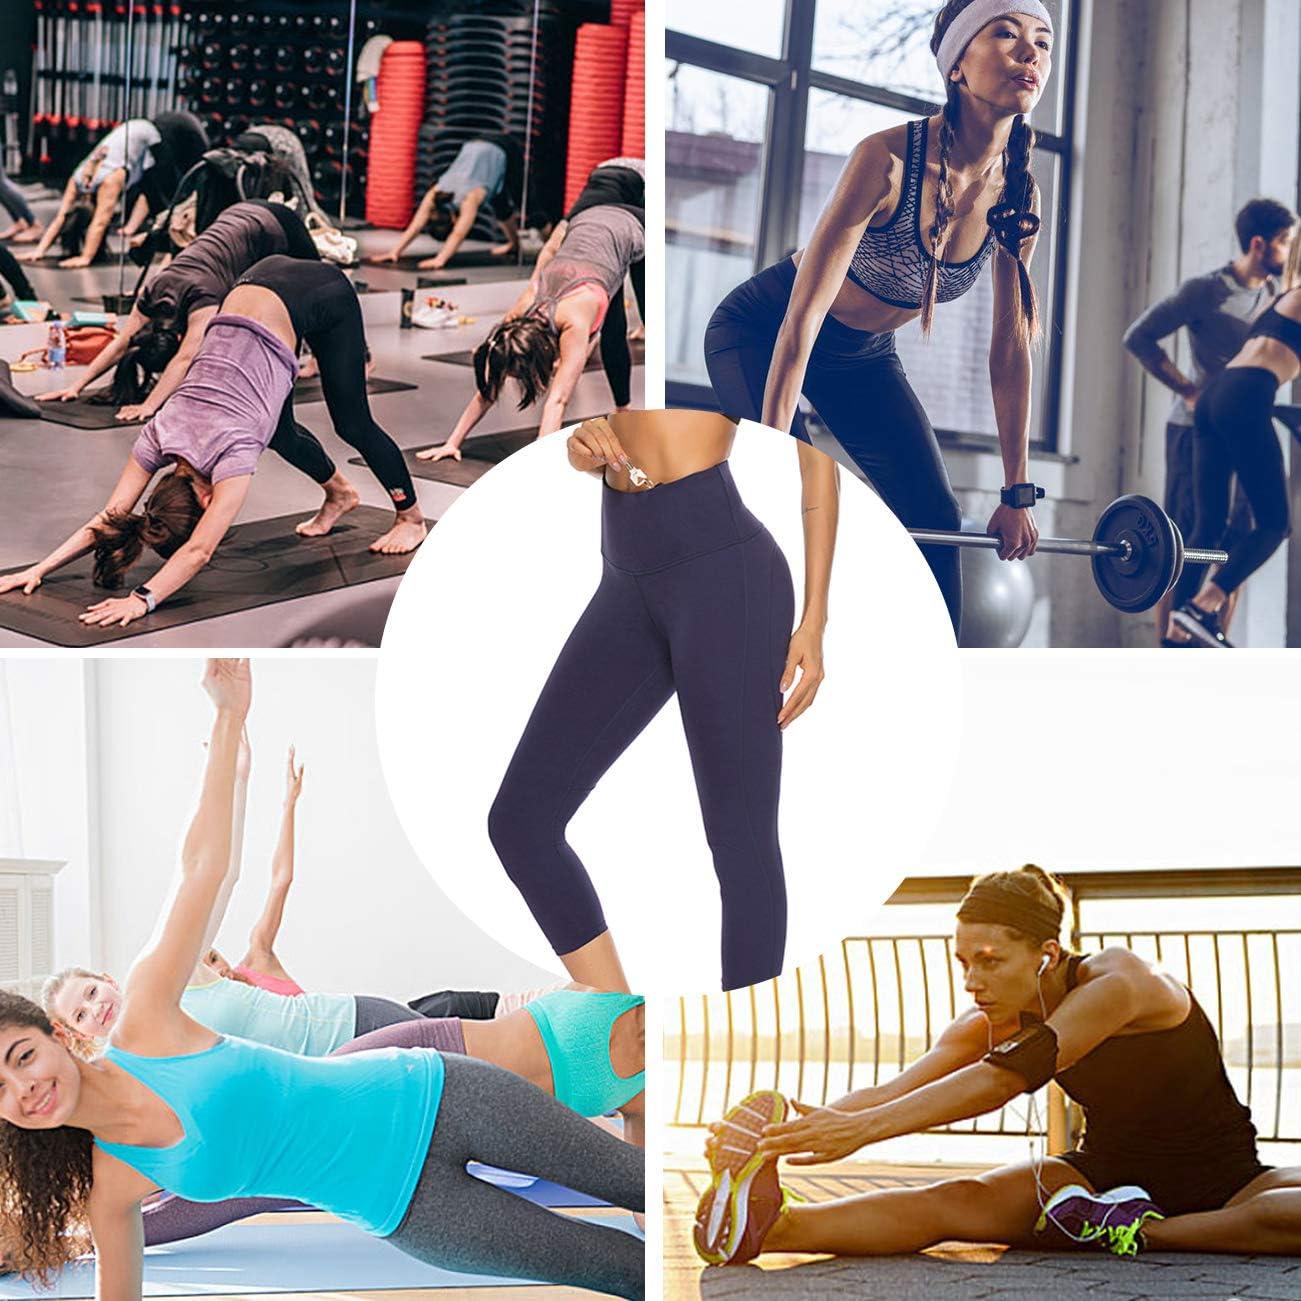 JOYMODE Womens High Waist Yoga Leggings Non See-Through Running Pants Workout Active Fitness Capris